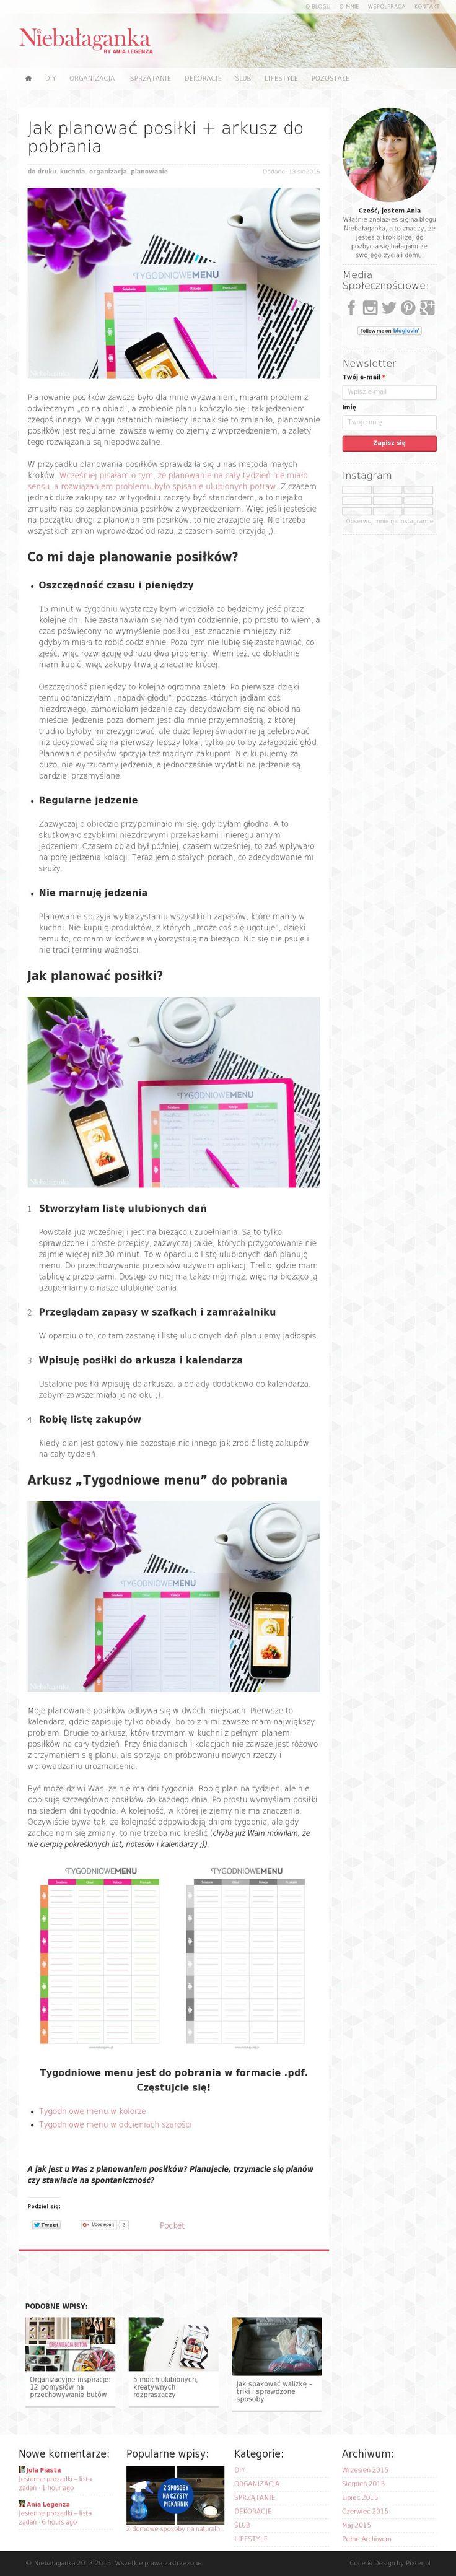 The website 'http://niebalaganka.pl/jak-planowac-posilki/' courtesy of @Pinstamatic (http://pinstamatic.com)